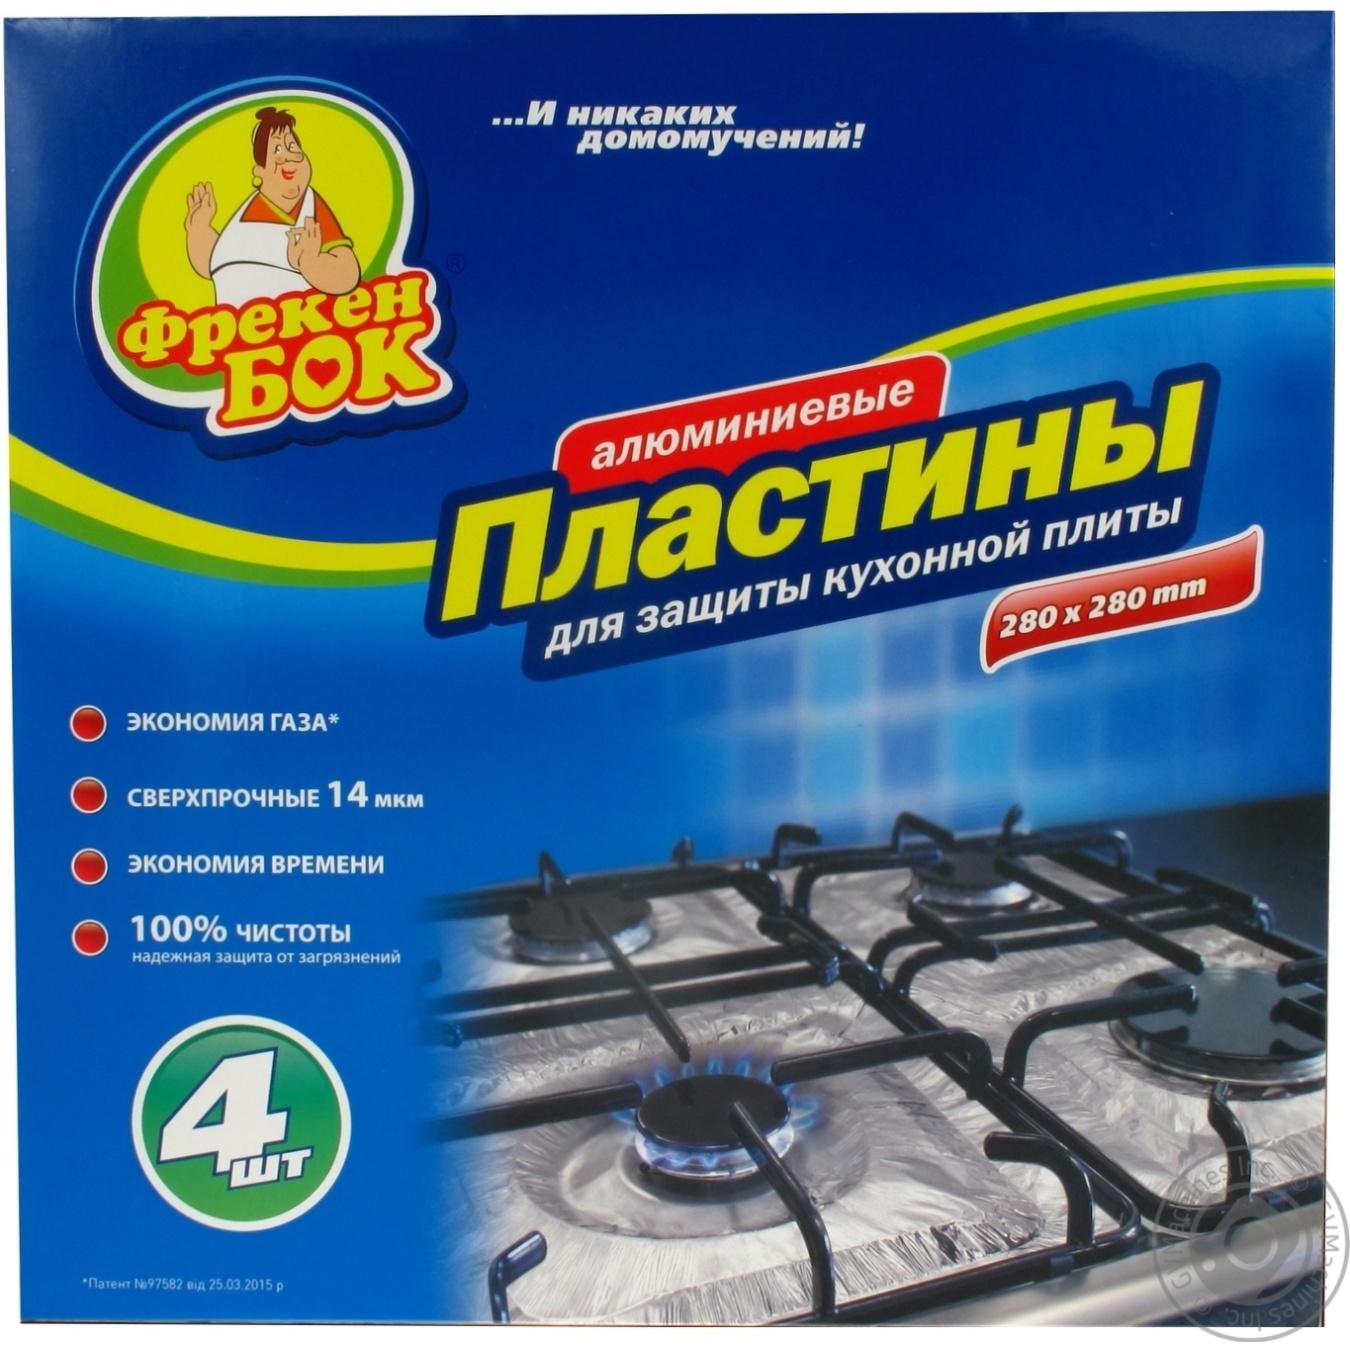 Купить Пластины Фрекен Бок для защиты кухонной плиты 280х280мм 4шт